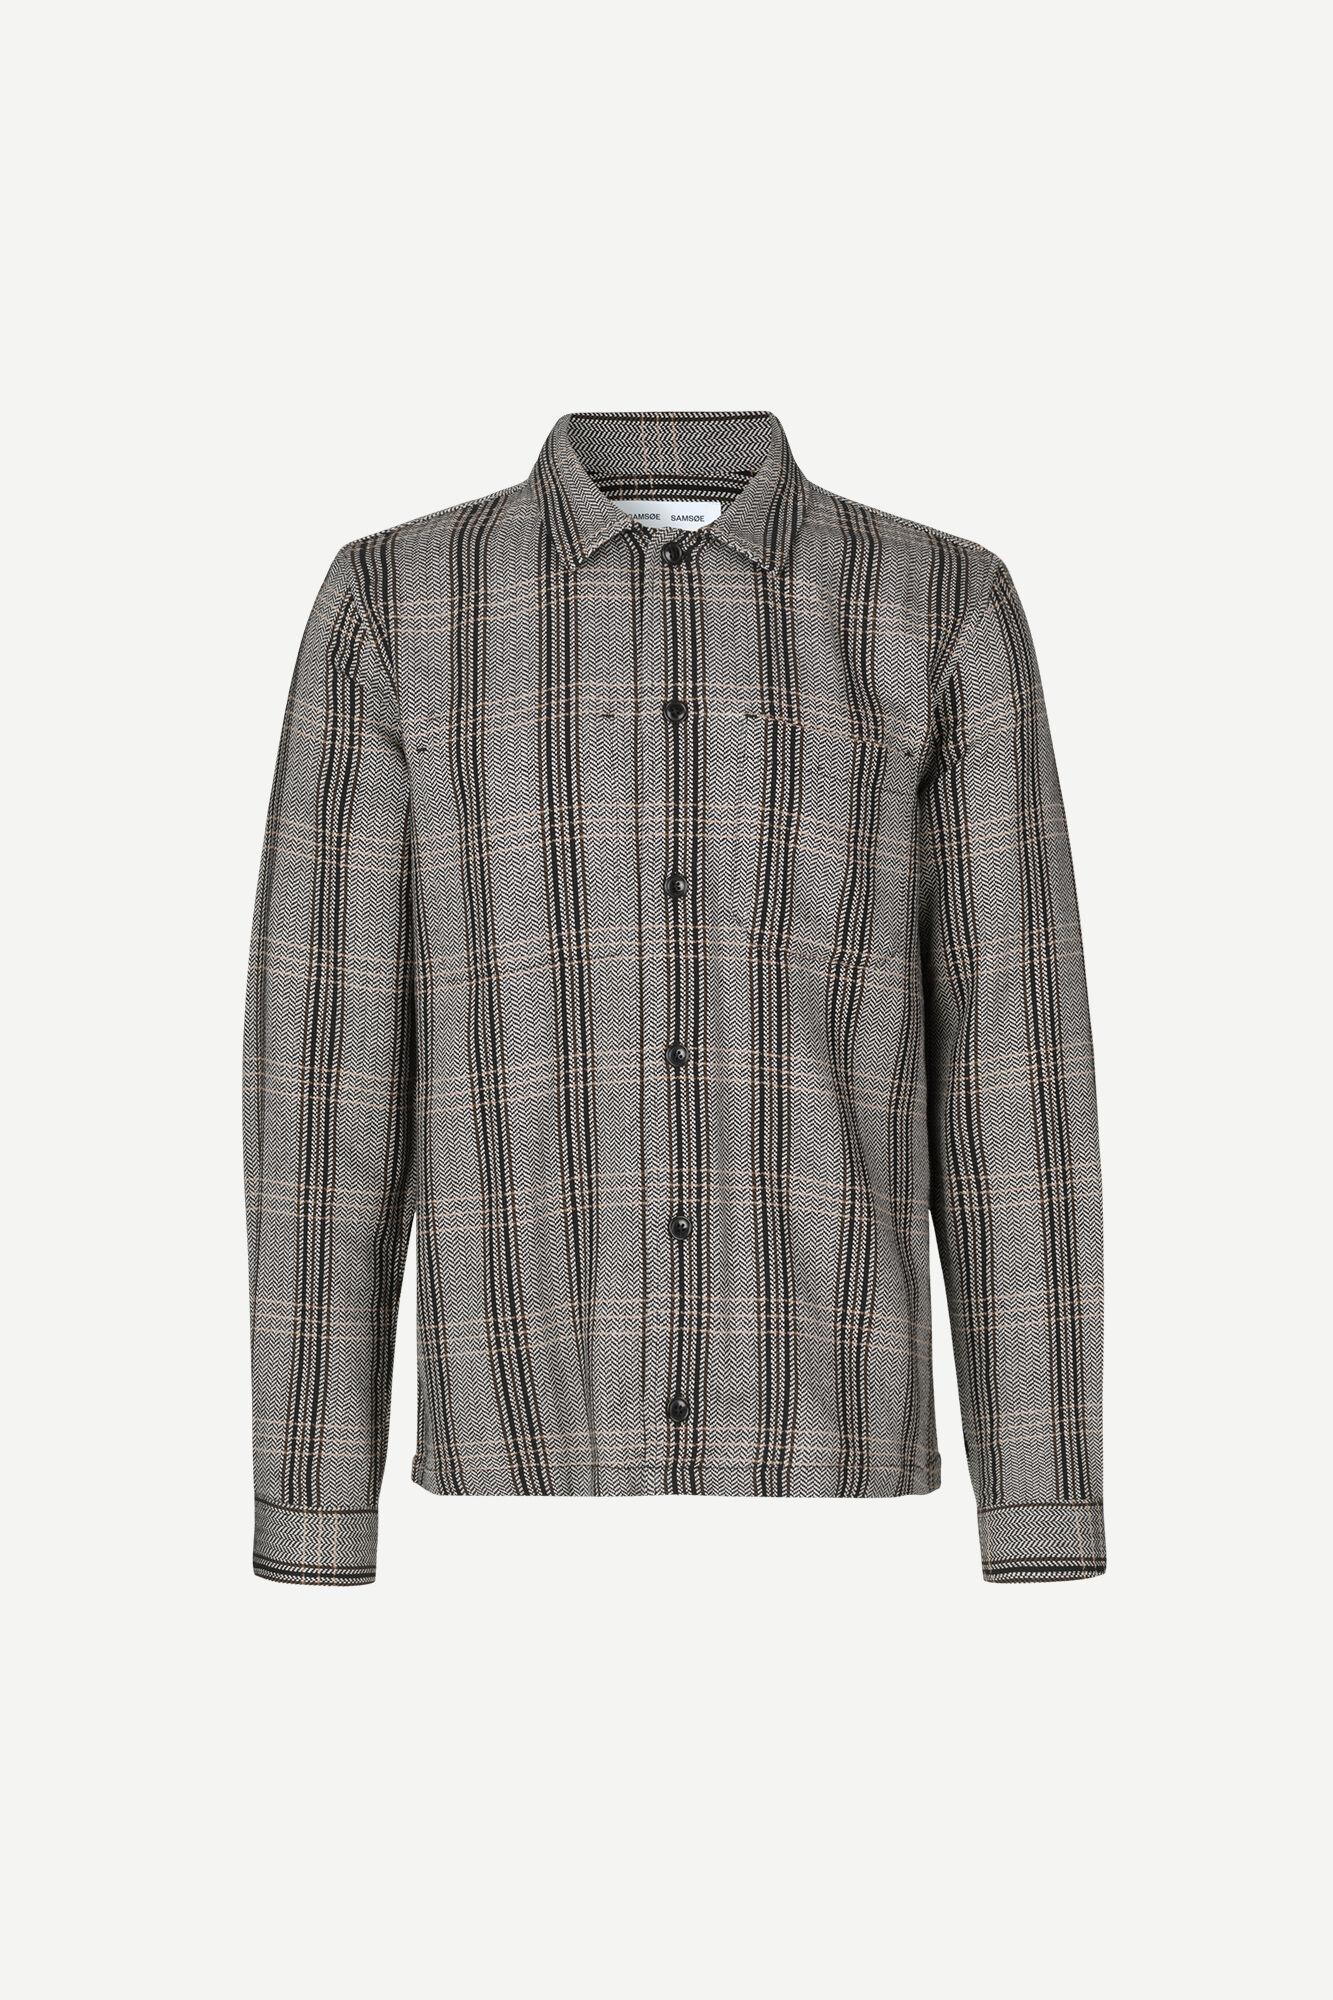 Ruffo JC shirt 11381, BLACK